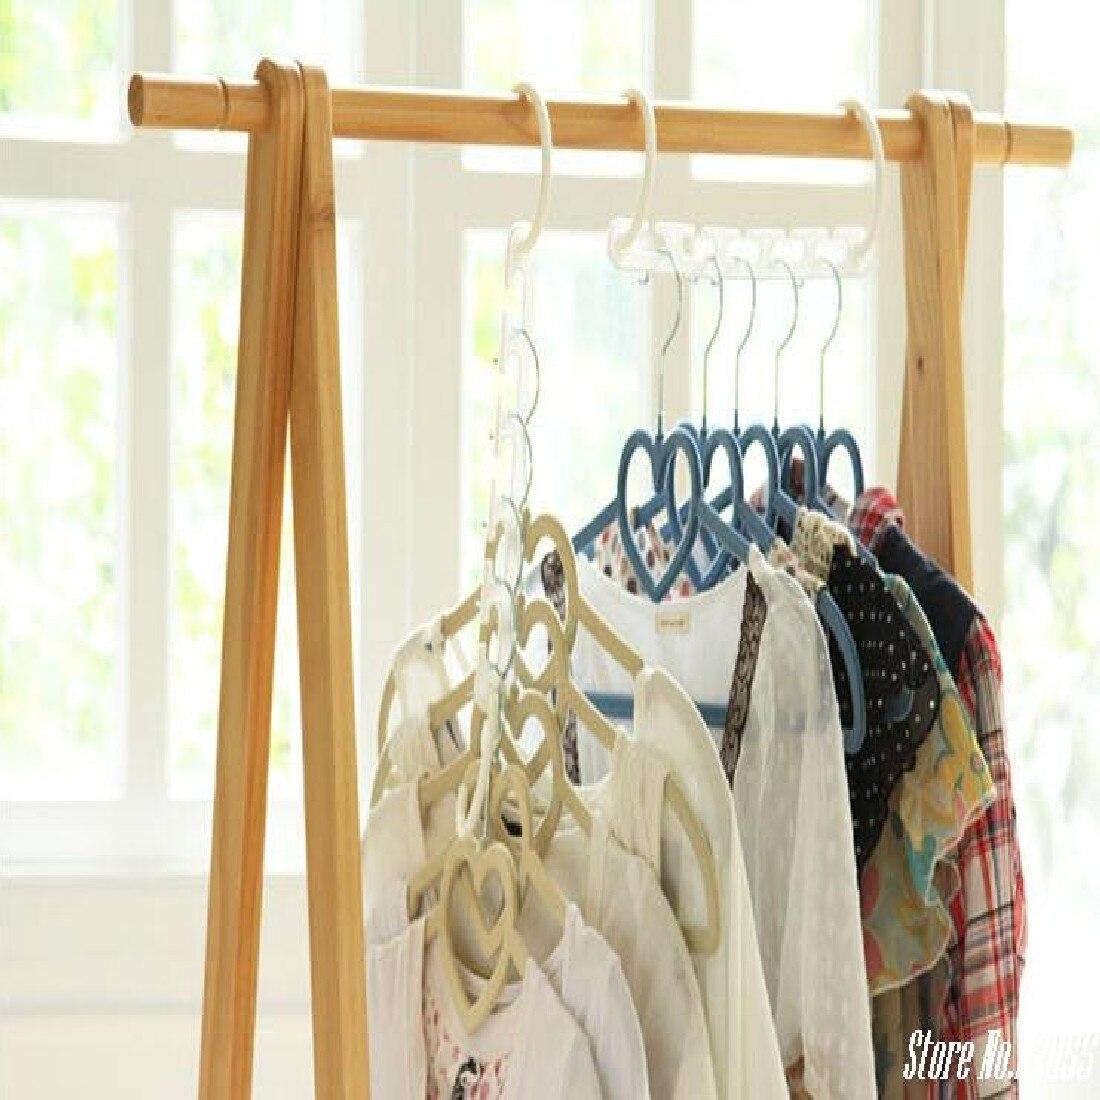 New Arrival 8Pcs Clothes Hanger Rack Wardrobes Shop Closet Wardrobe Clothing Hooks Space Saver Home Organizer Set